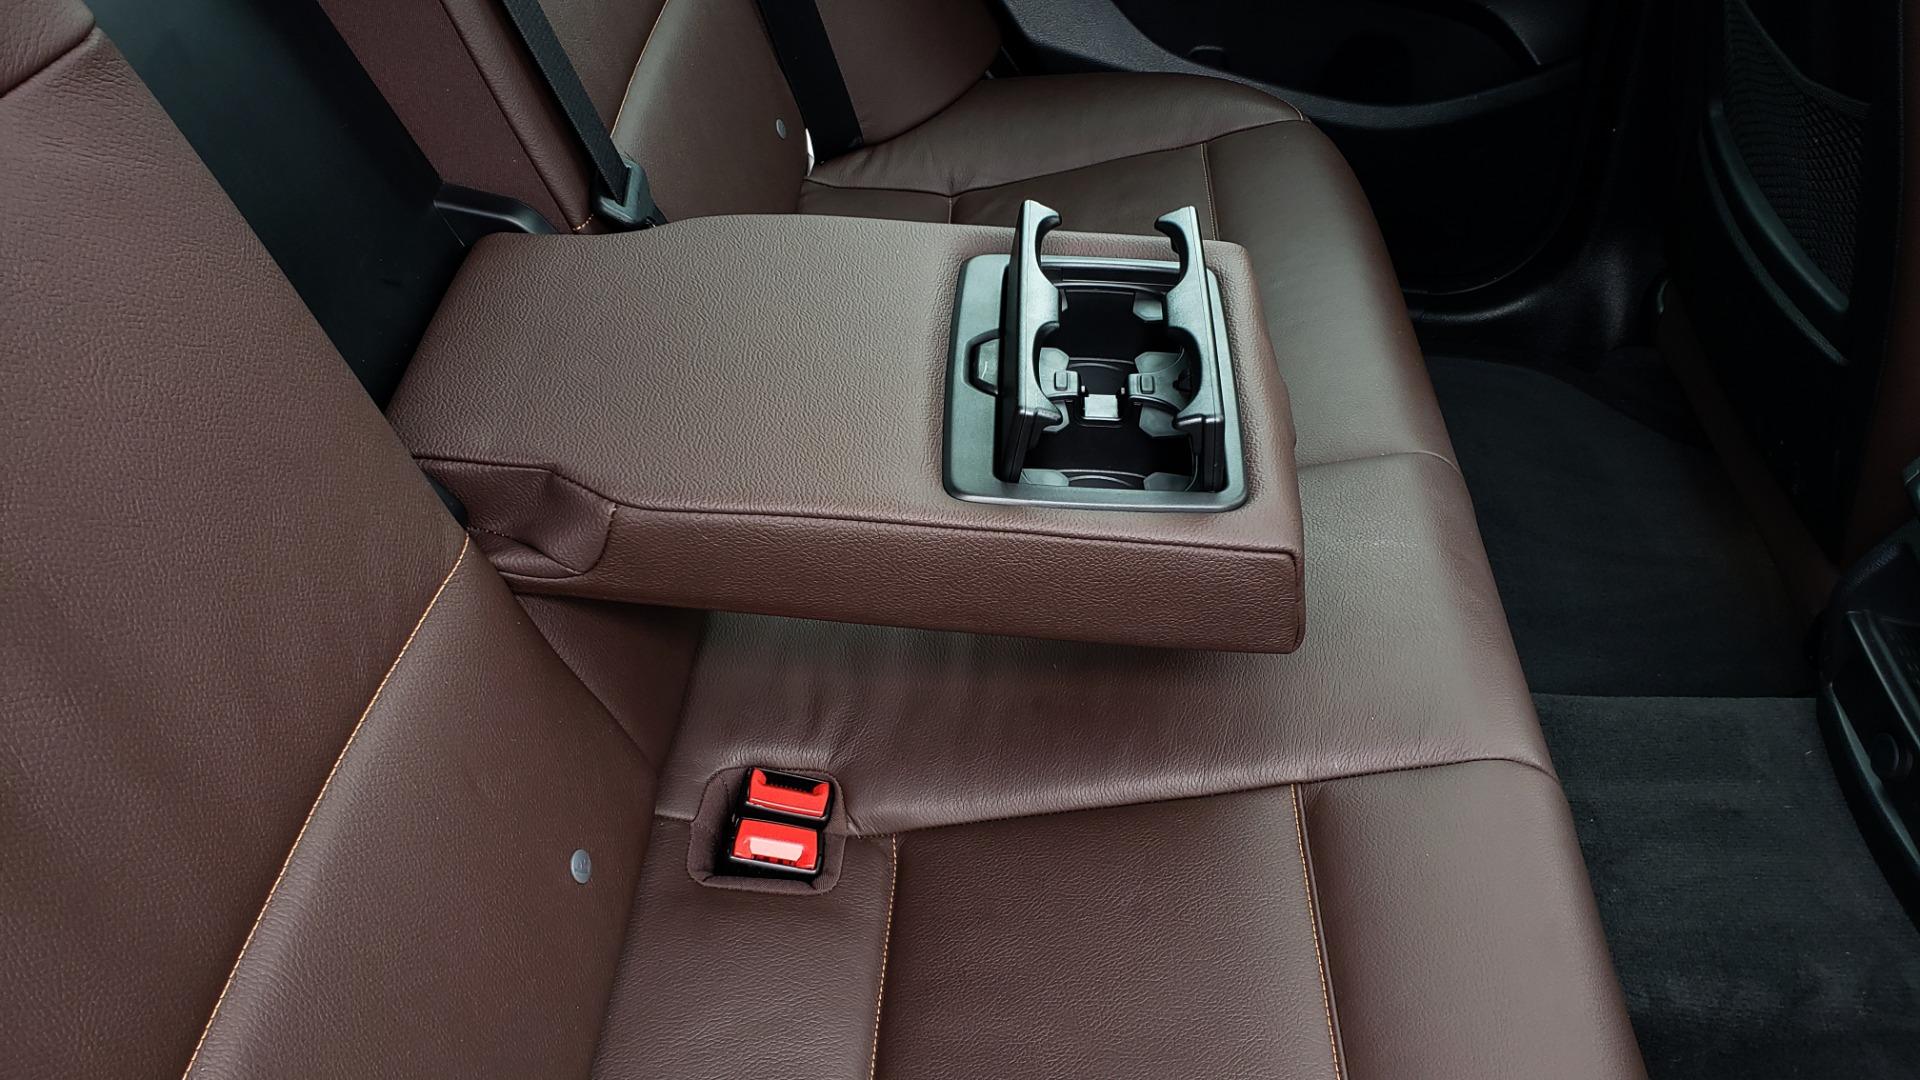 Used 2017 BMW X3 XDRIVE35I M-SPORT / DRVR ASST PLUS / TECHNOLOGY / HUD / BLIND SPOT for sale Sold at Formula Imports in Charlotte NC 28227 69